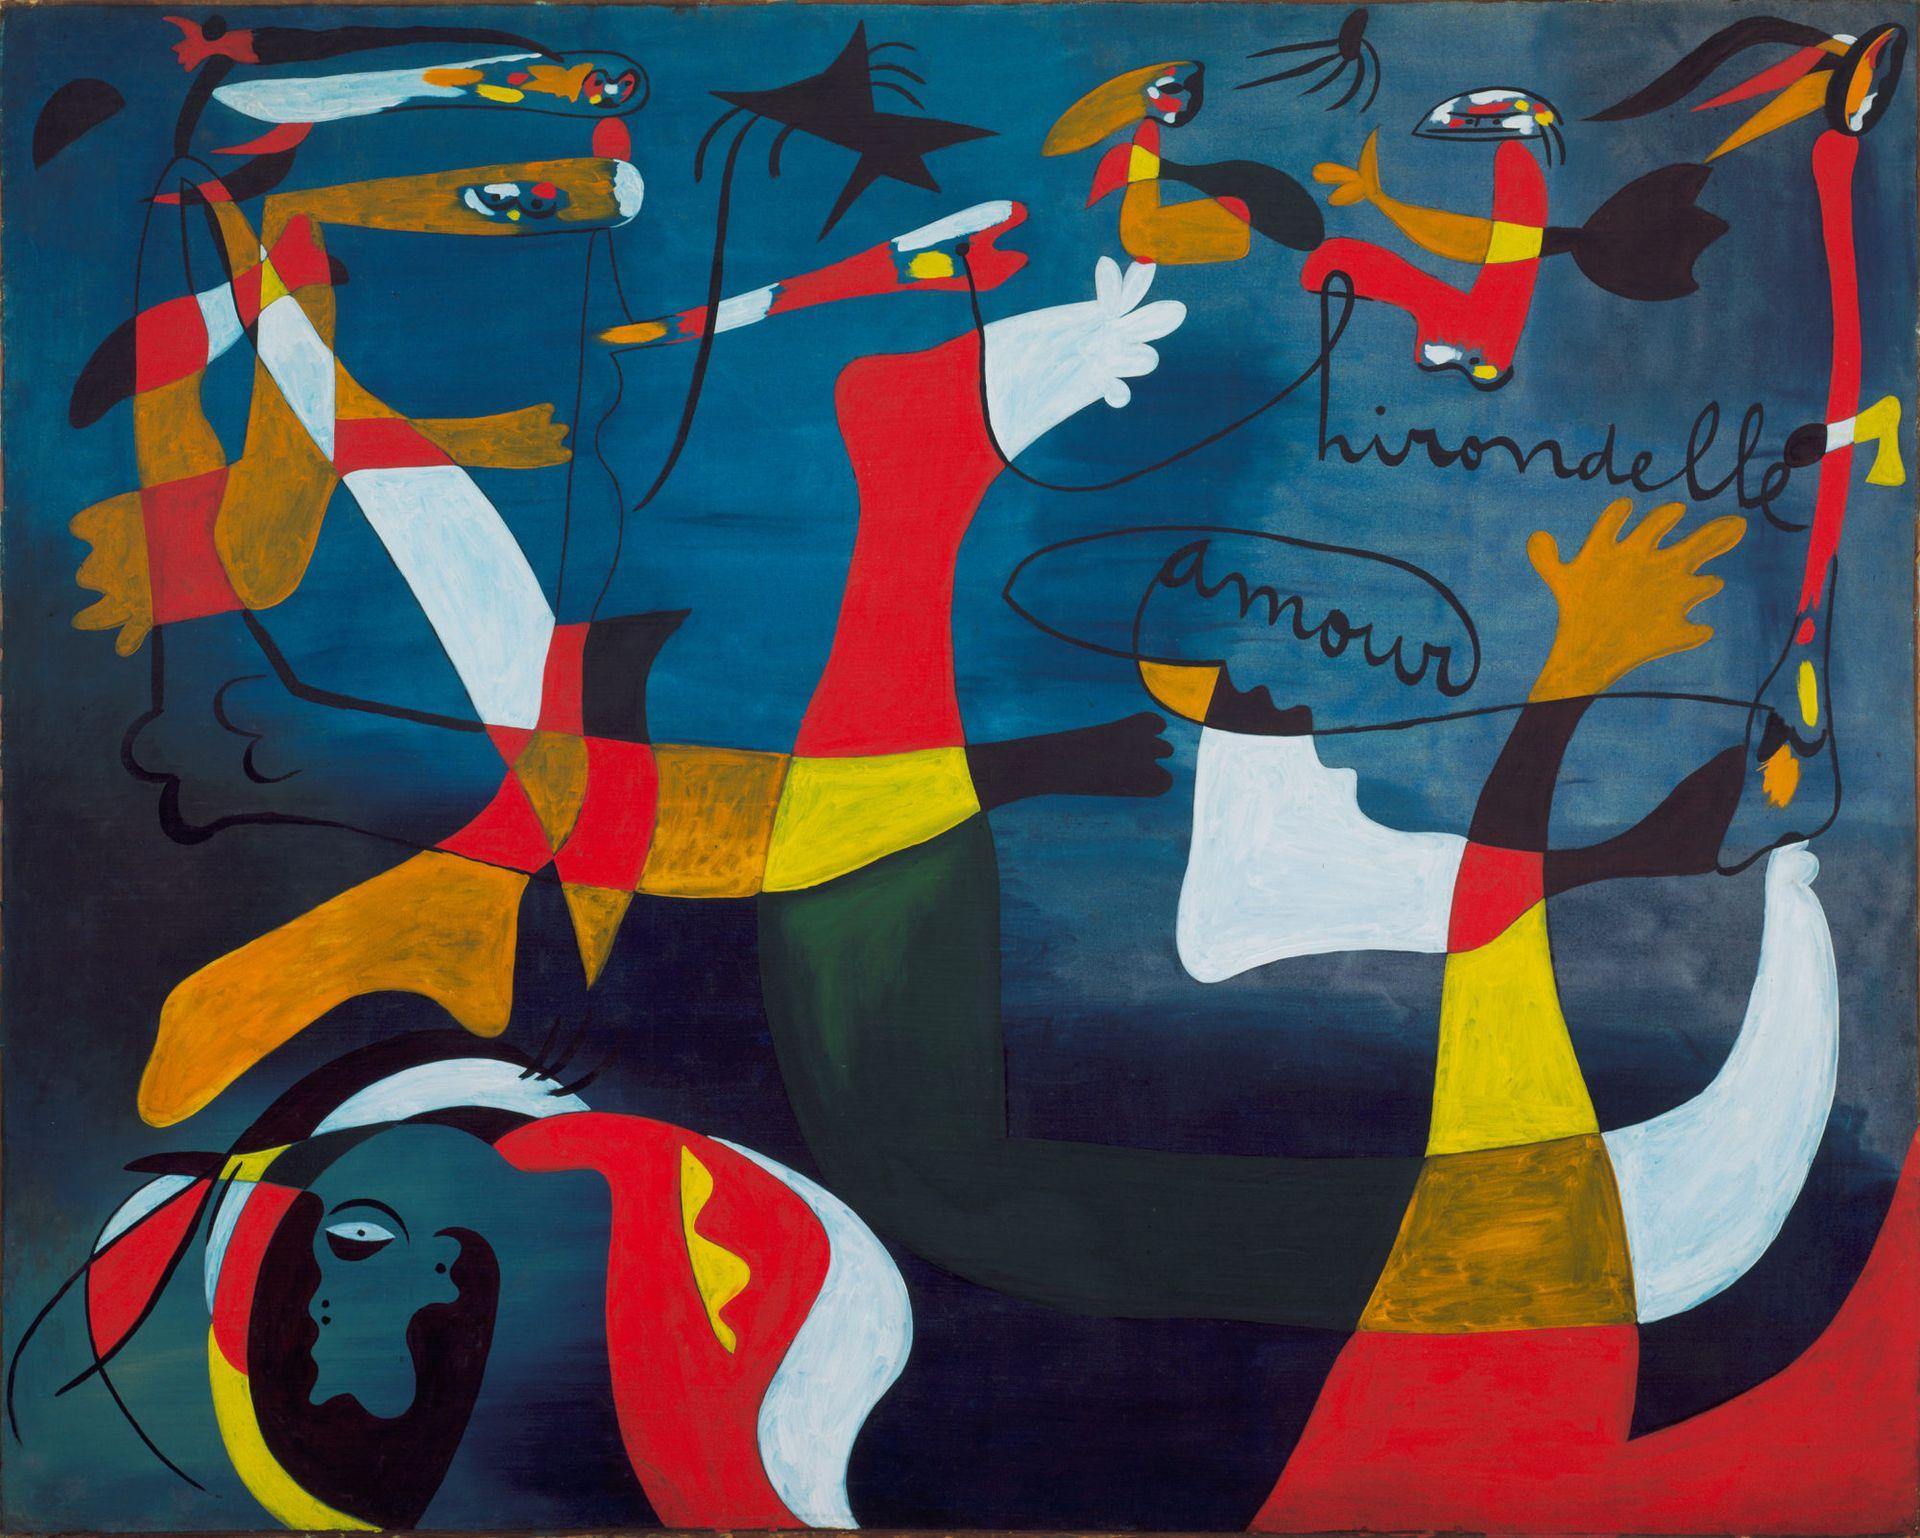 Joan Miró, Hirondelle Amour (1933-34) © 2018 Successió  Miró / Artists Rights Society (ARS), New York / ADAGP, Paris